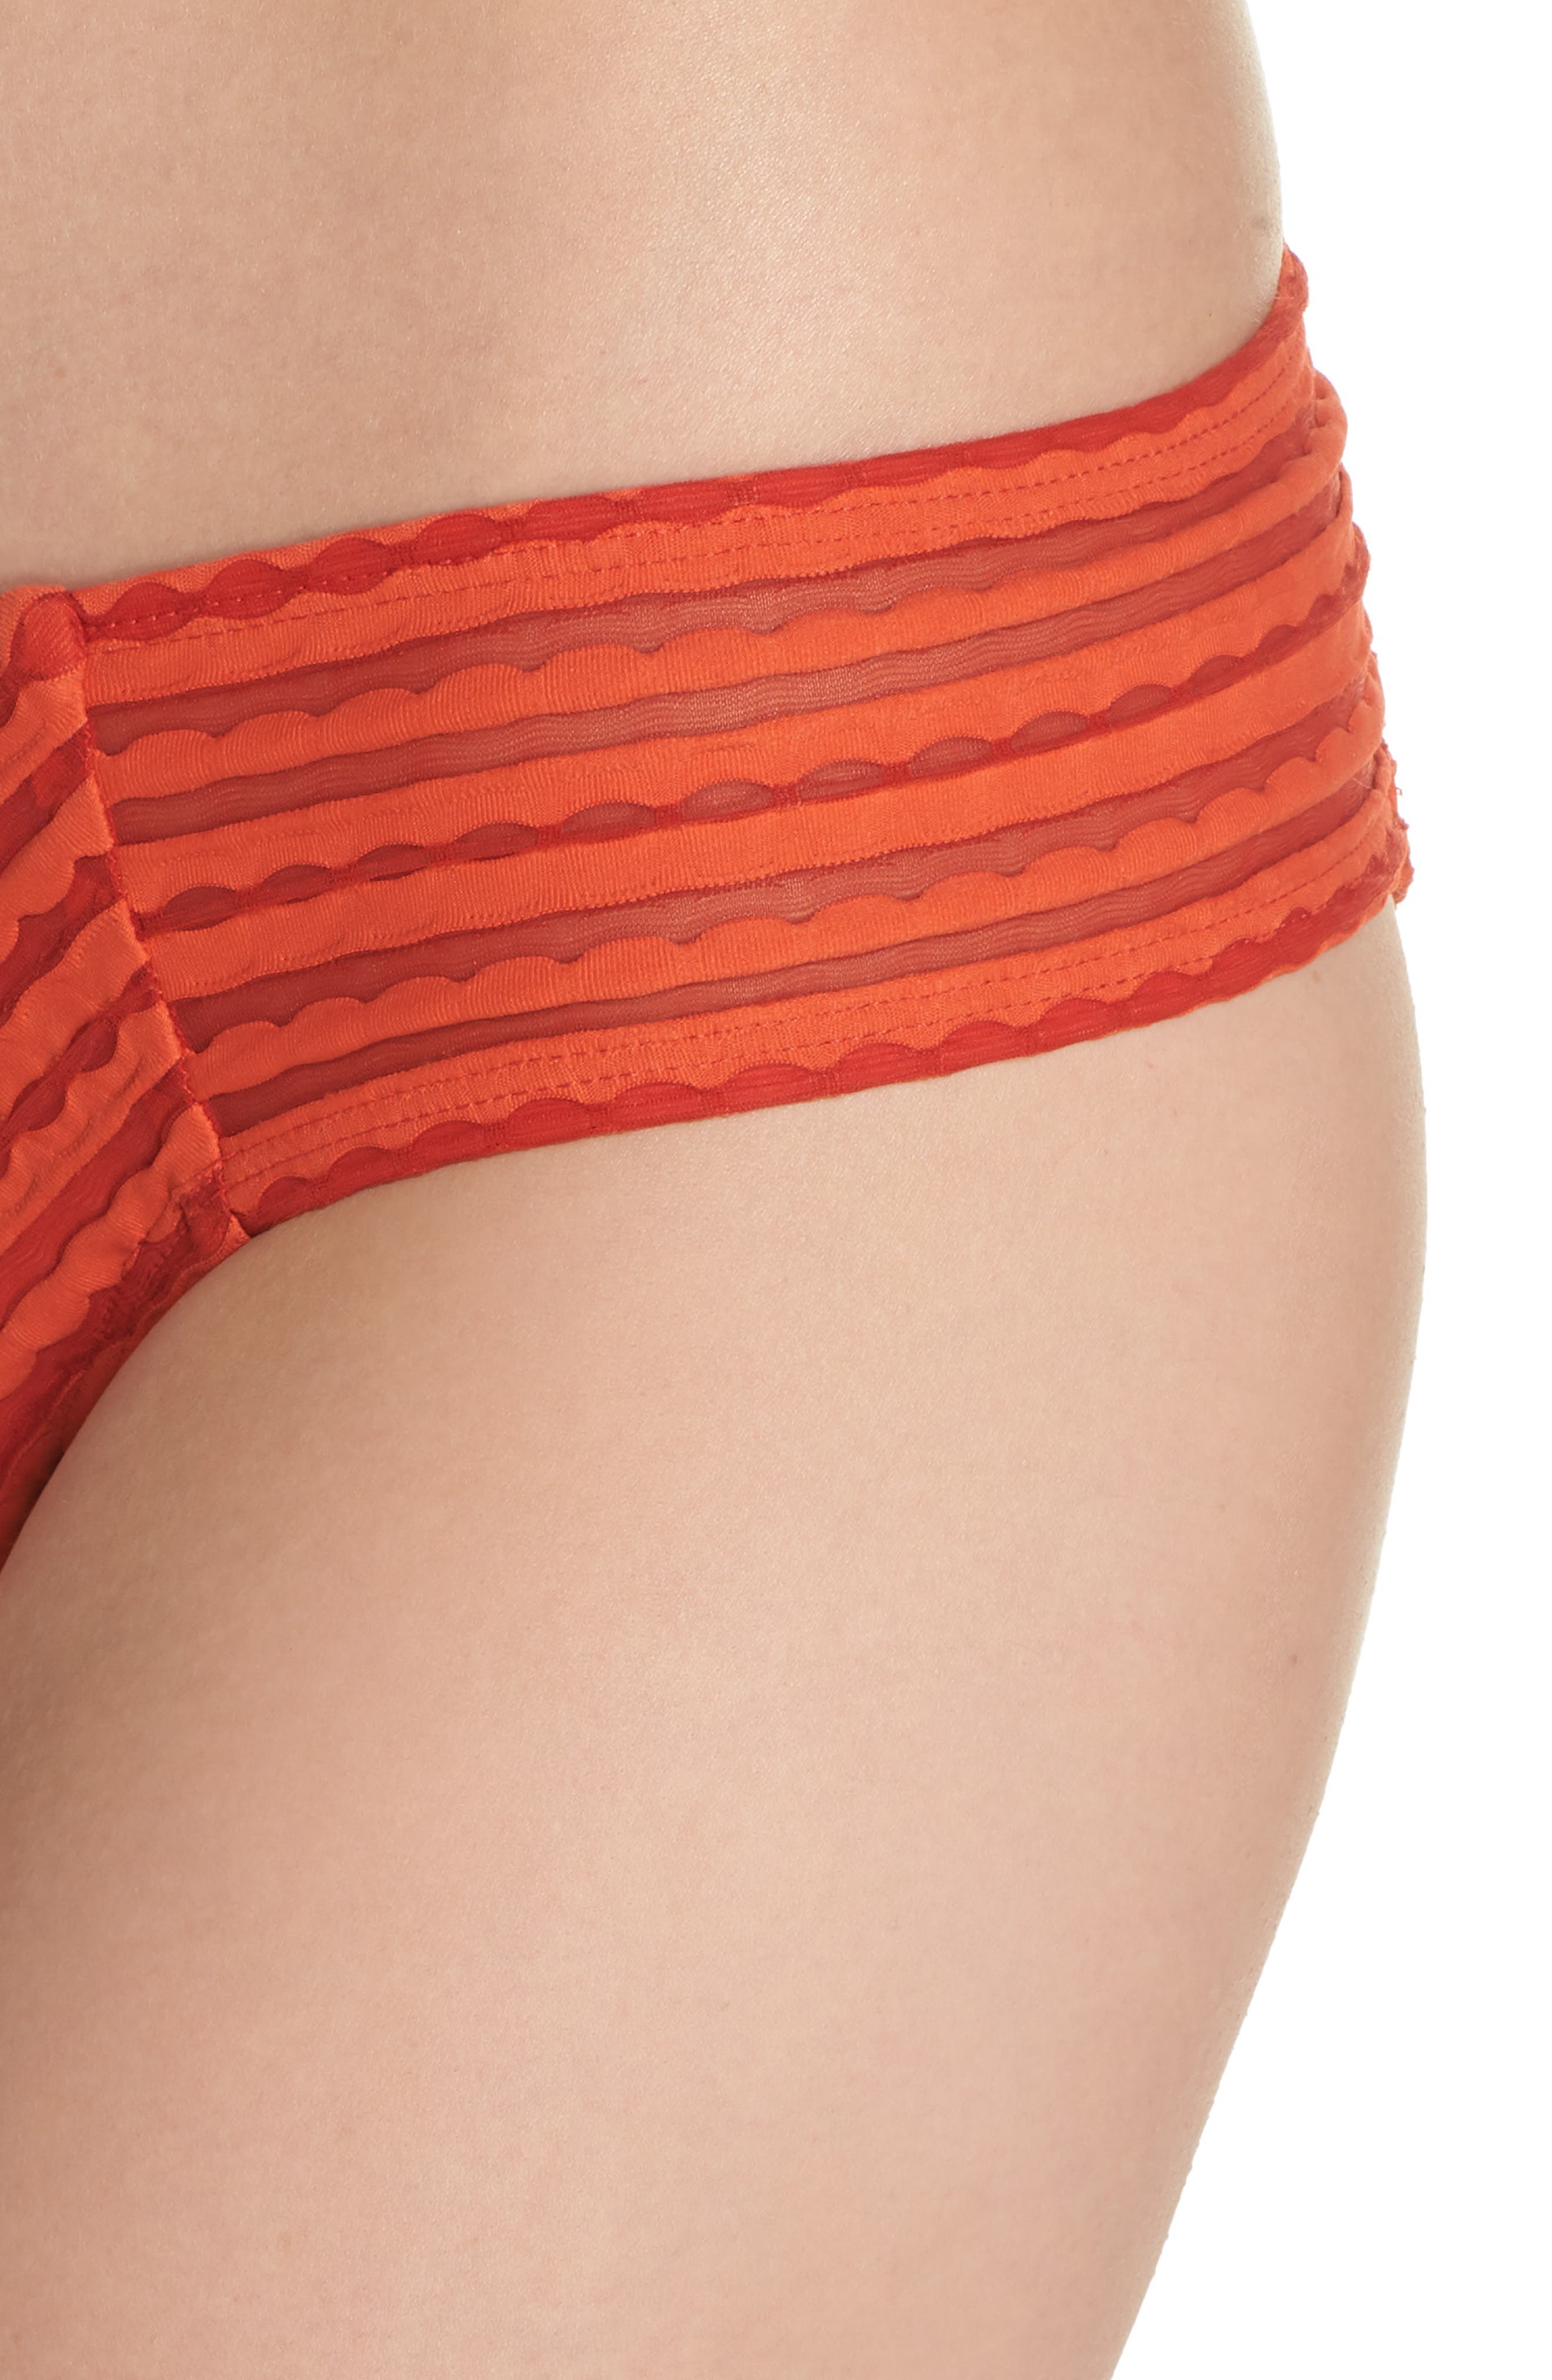 Carly Hipster Bikini Bottoms,                             Alternate thumbnail 4, color,                             PIMENTO